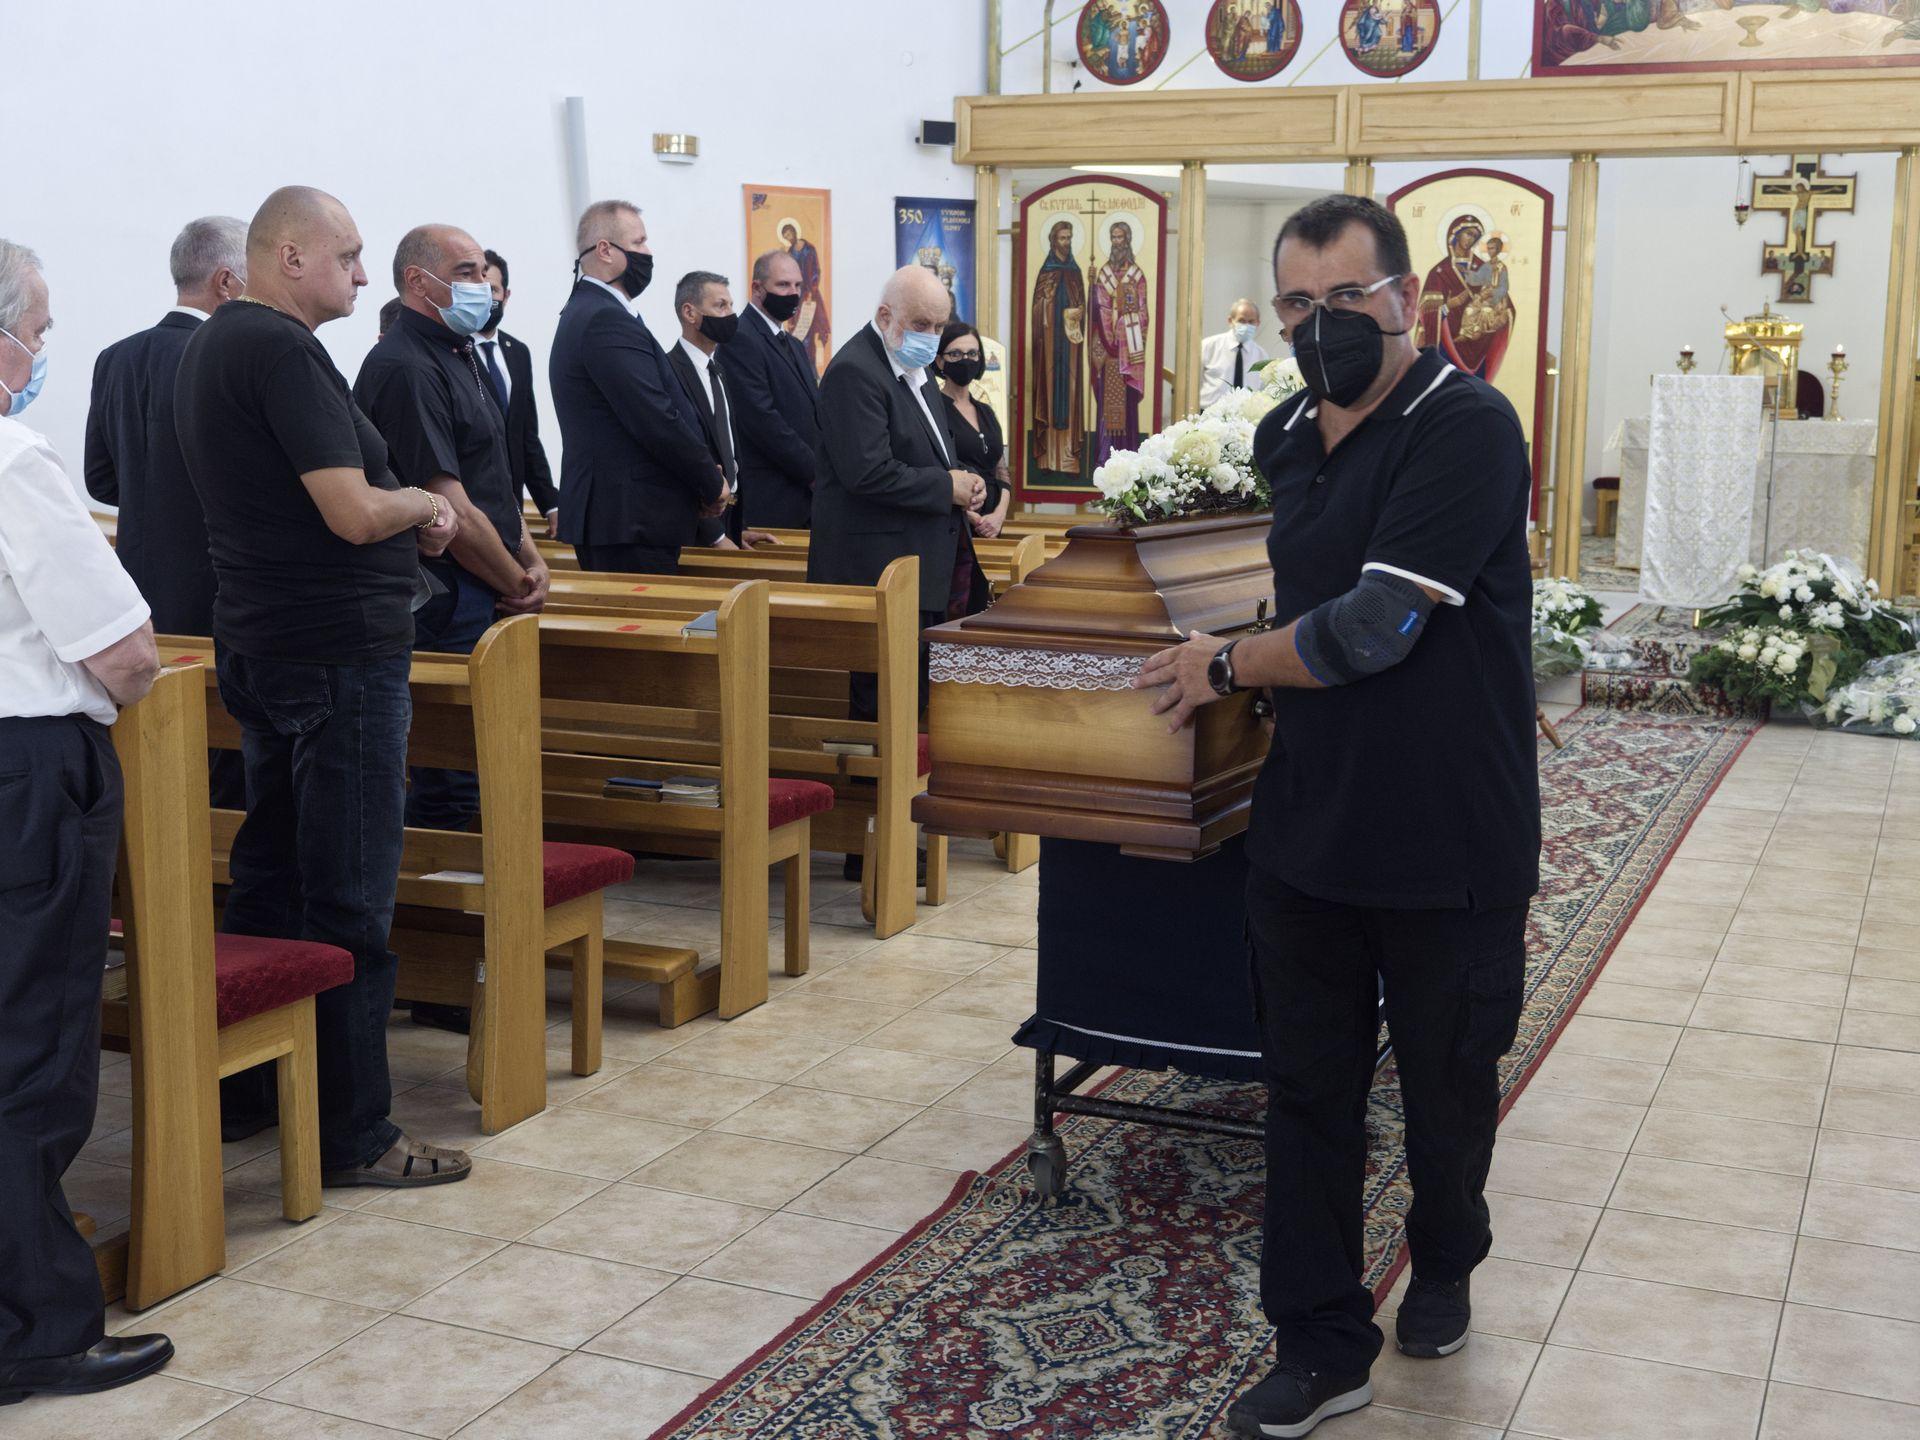 PohrebMikulasCecko34